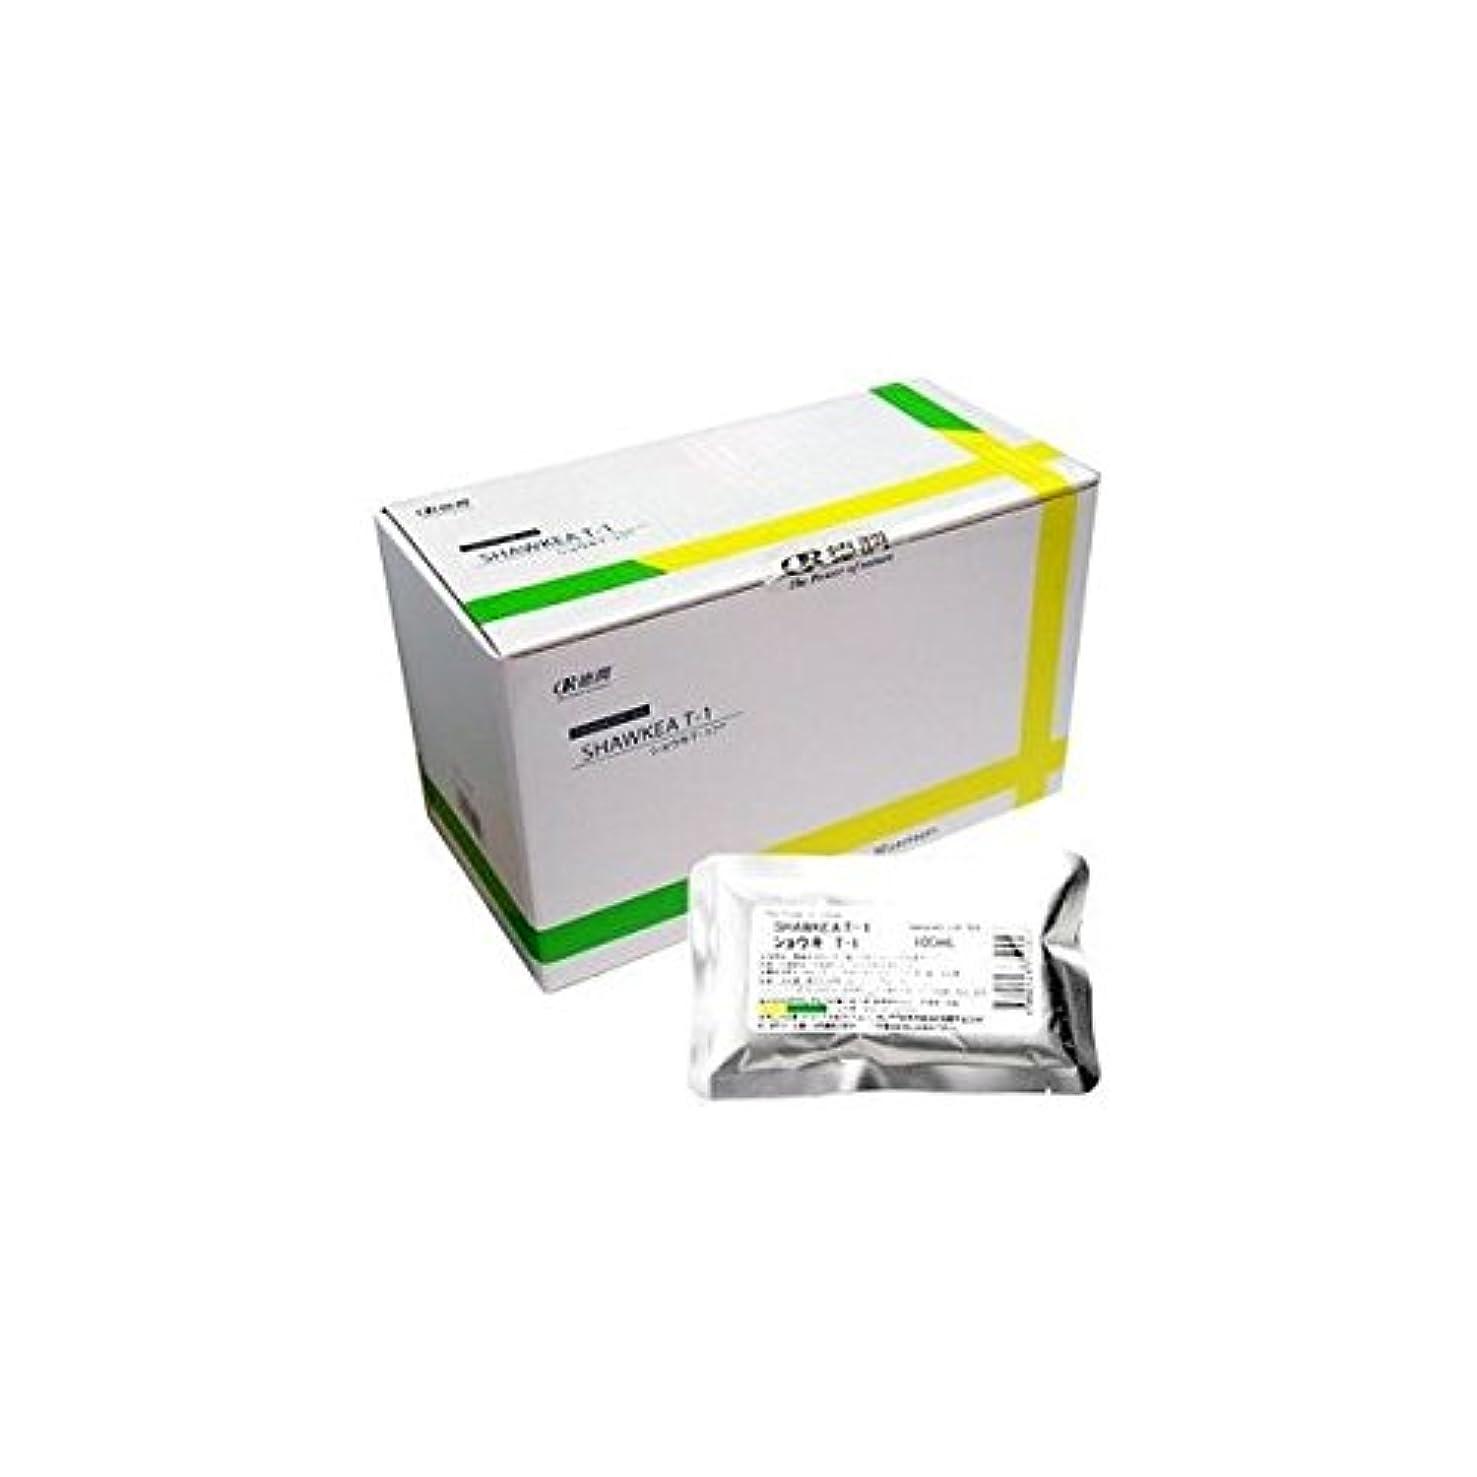 【P&G】ウエラトーン ツープラスワン(2+1) クリーム 6G(60g+60gl+7.3ml) (医薬部外品)(お買い得3個セット)